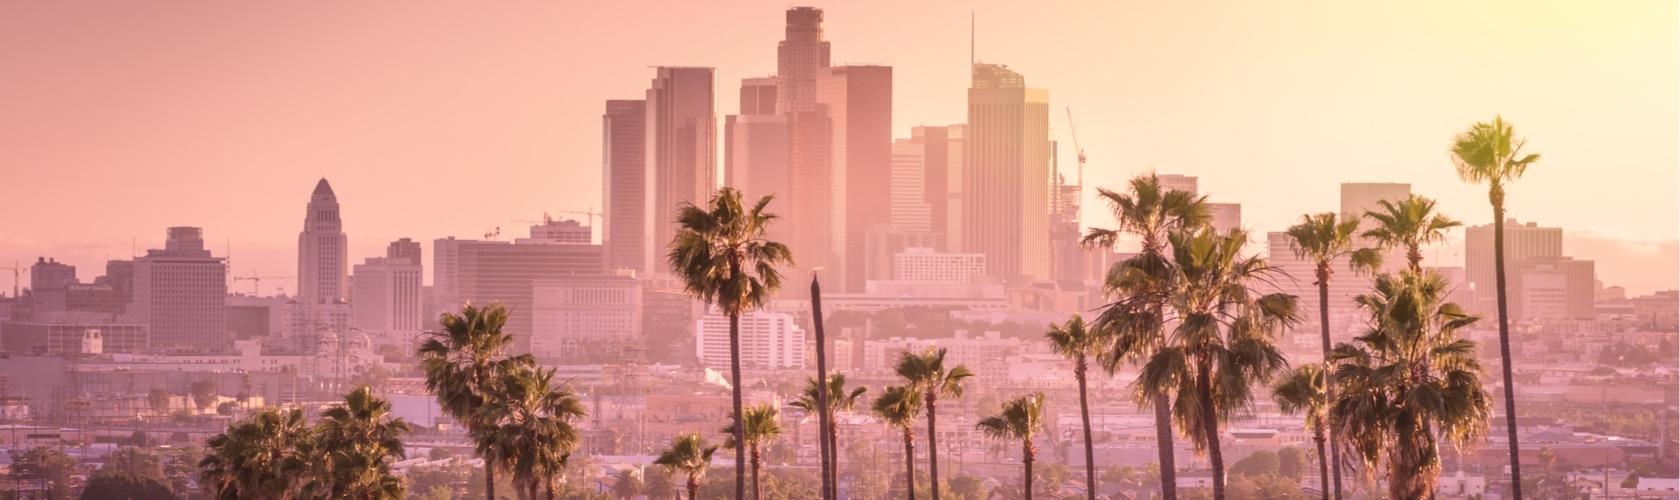 Los Angeles Phocuswright conference